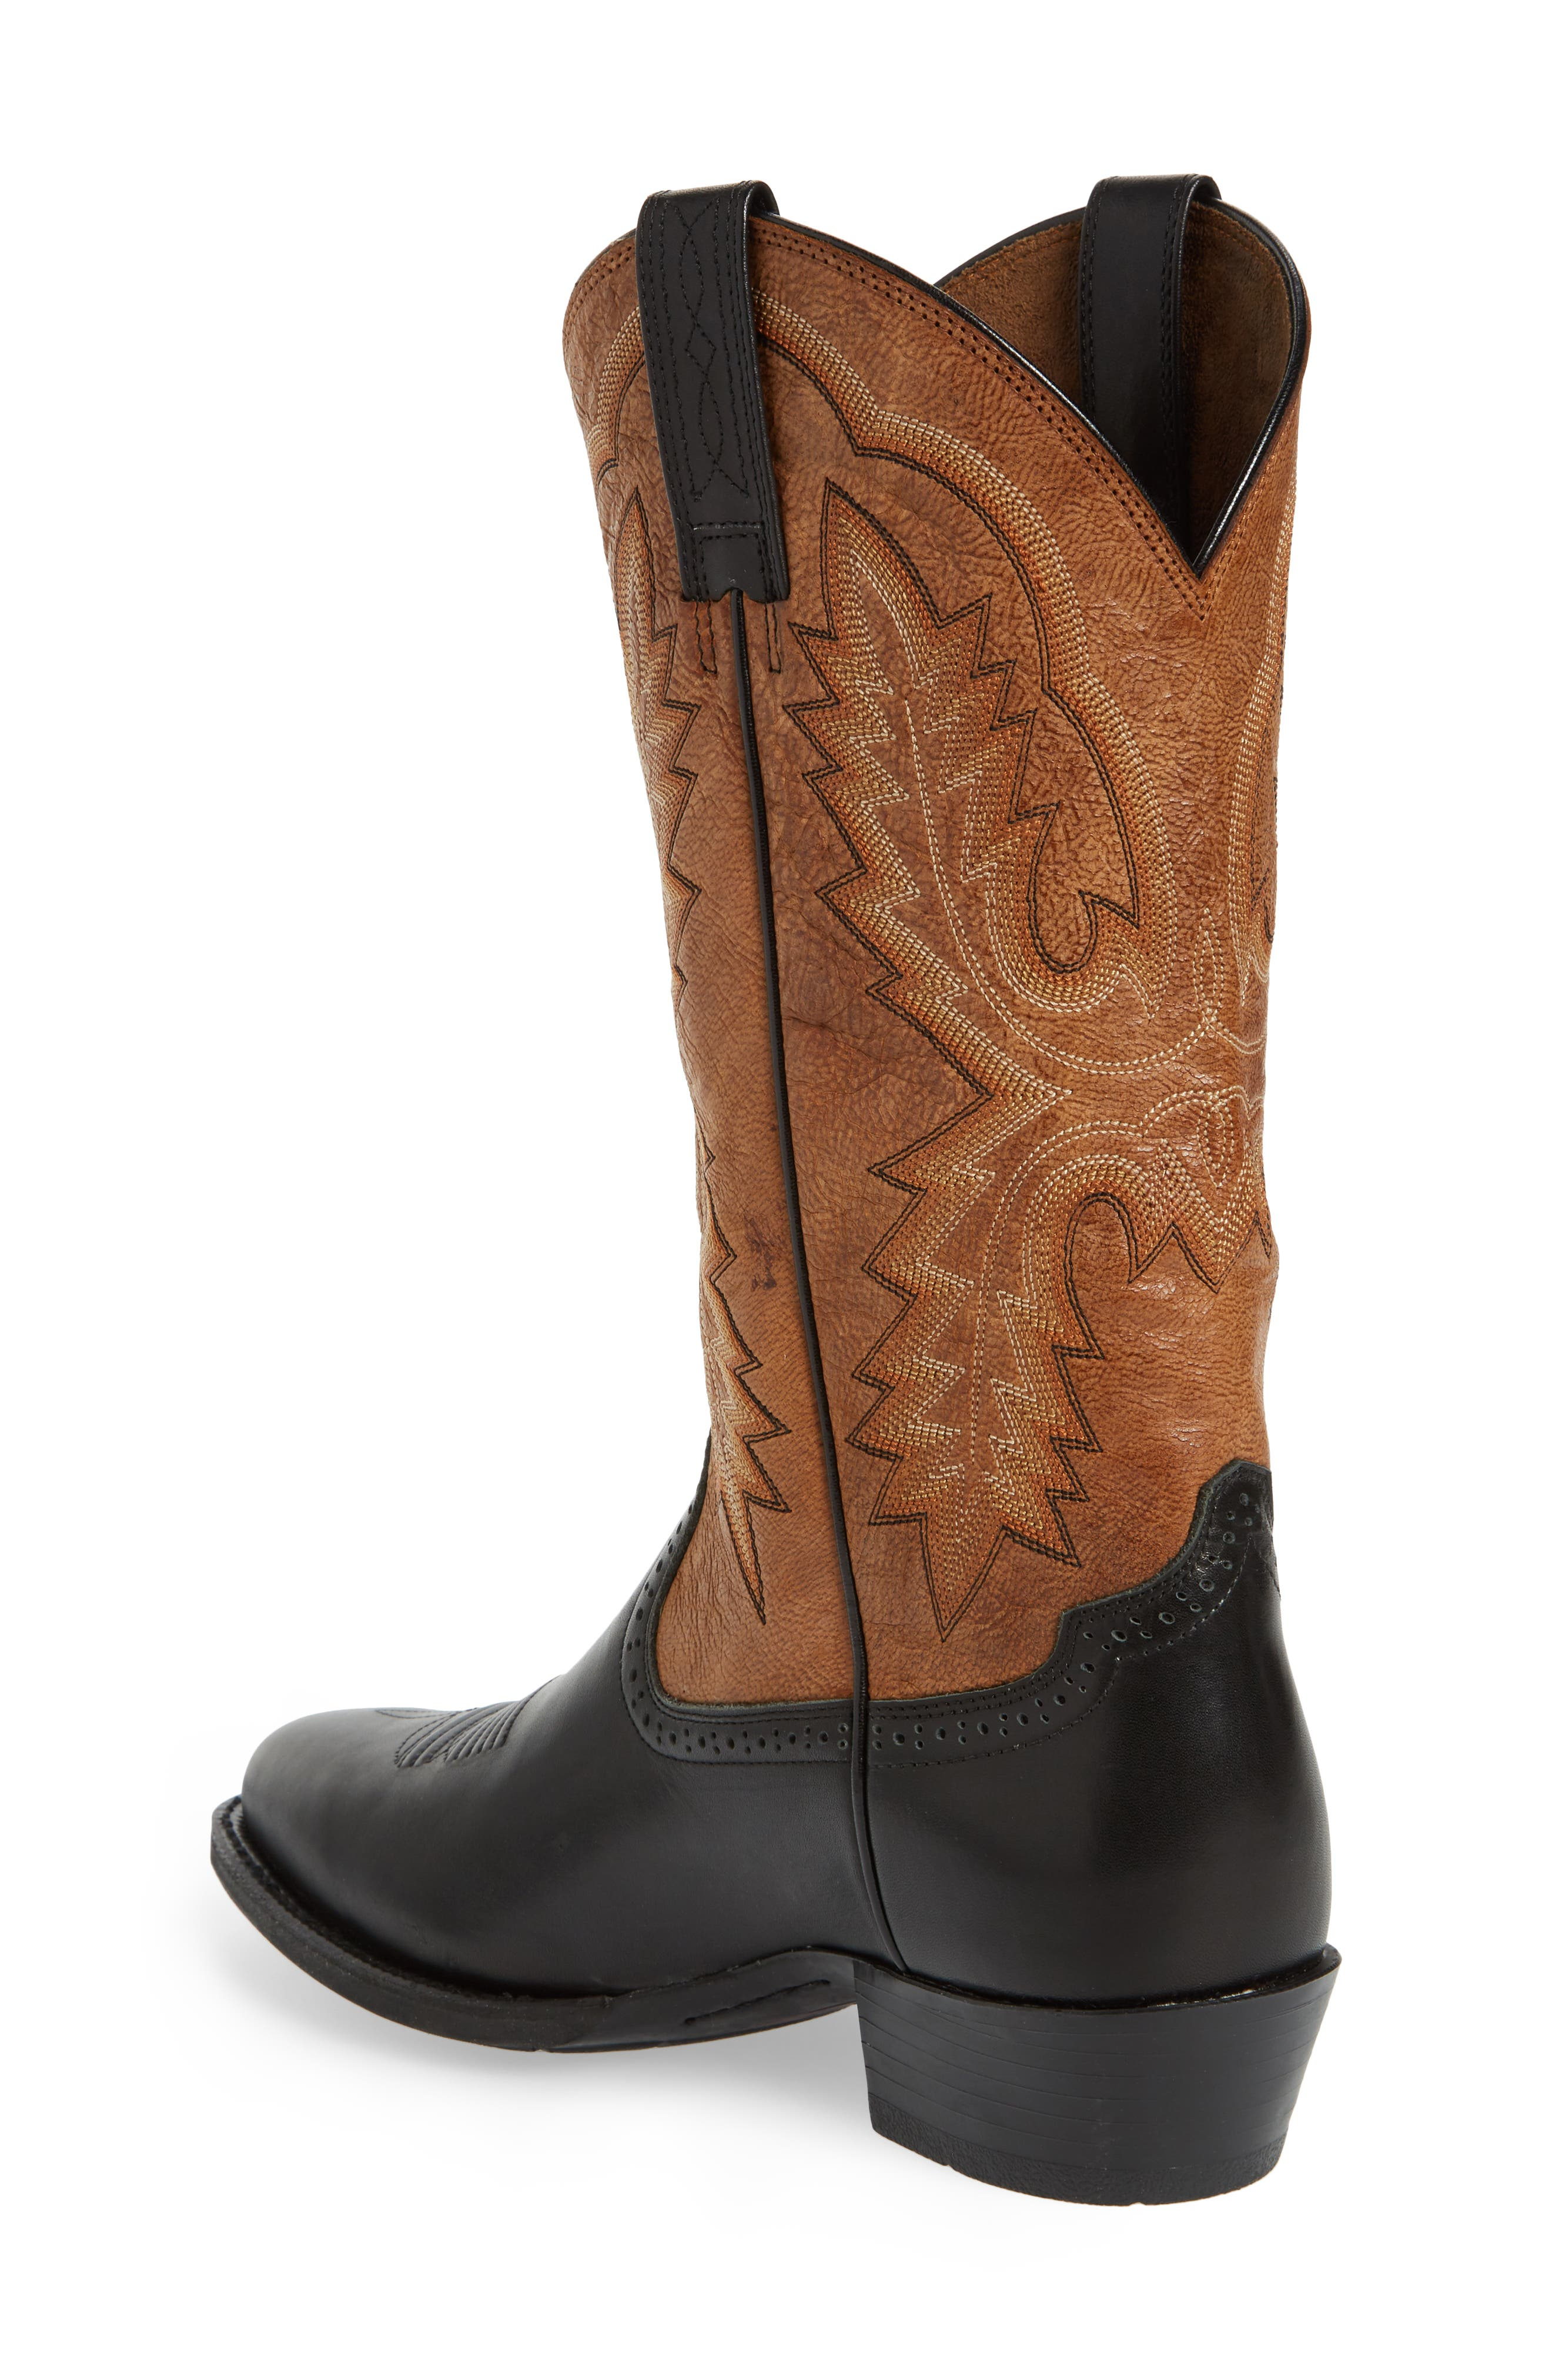 Alternate Image 2  - Ariat Heritage Calhoun Western R-Toe Boot (Men)